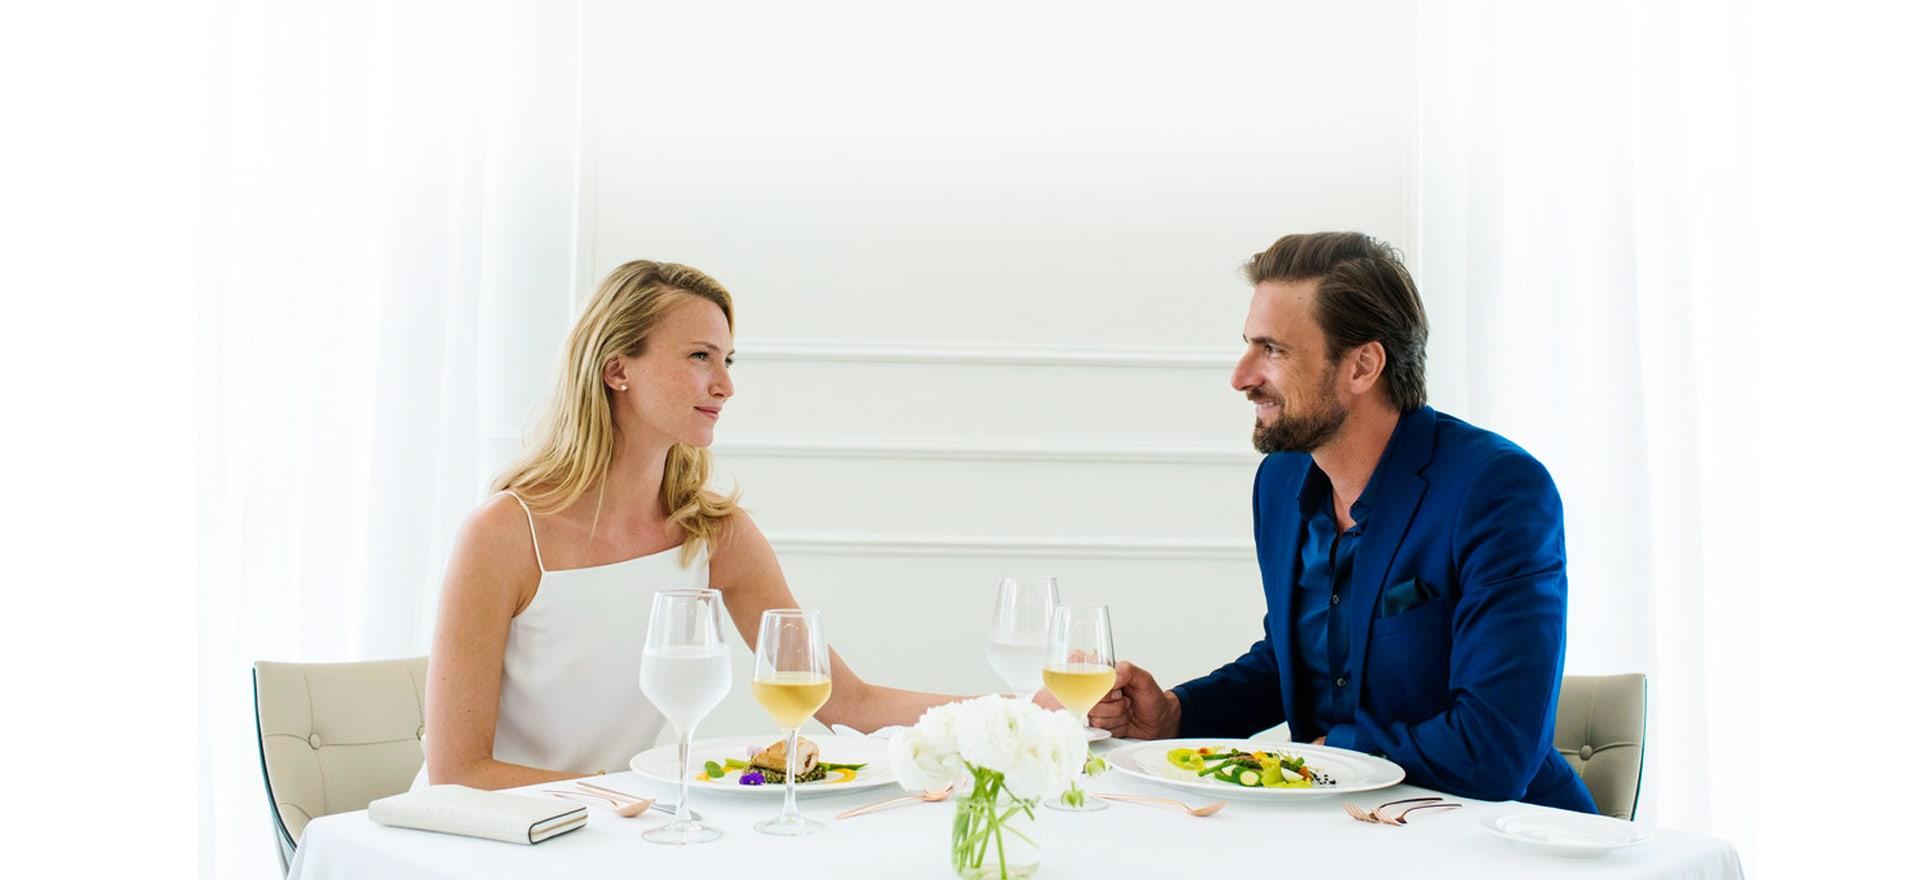 Romance image 1